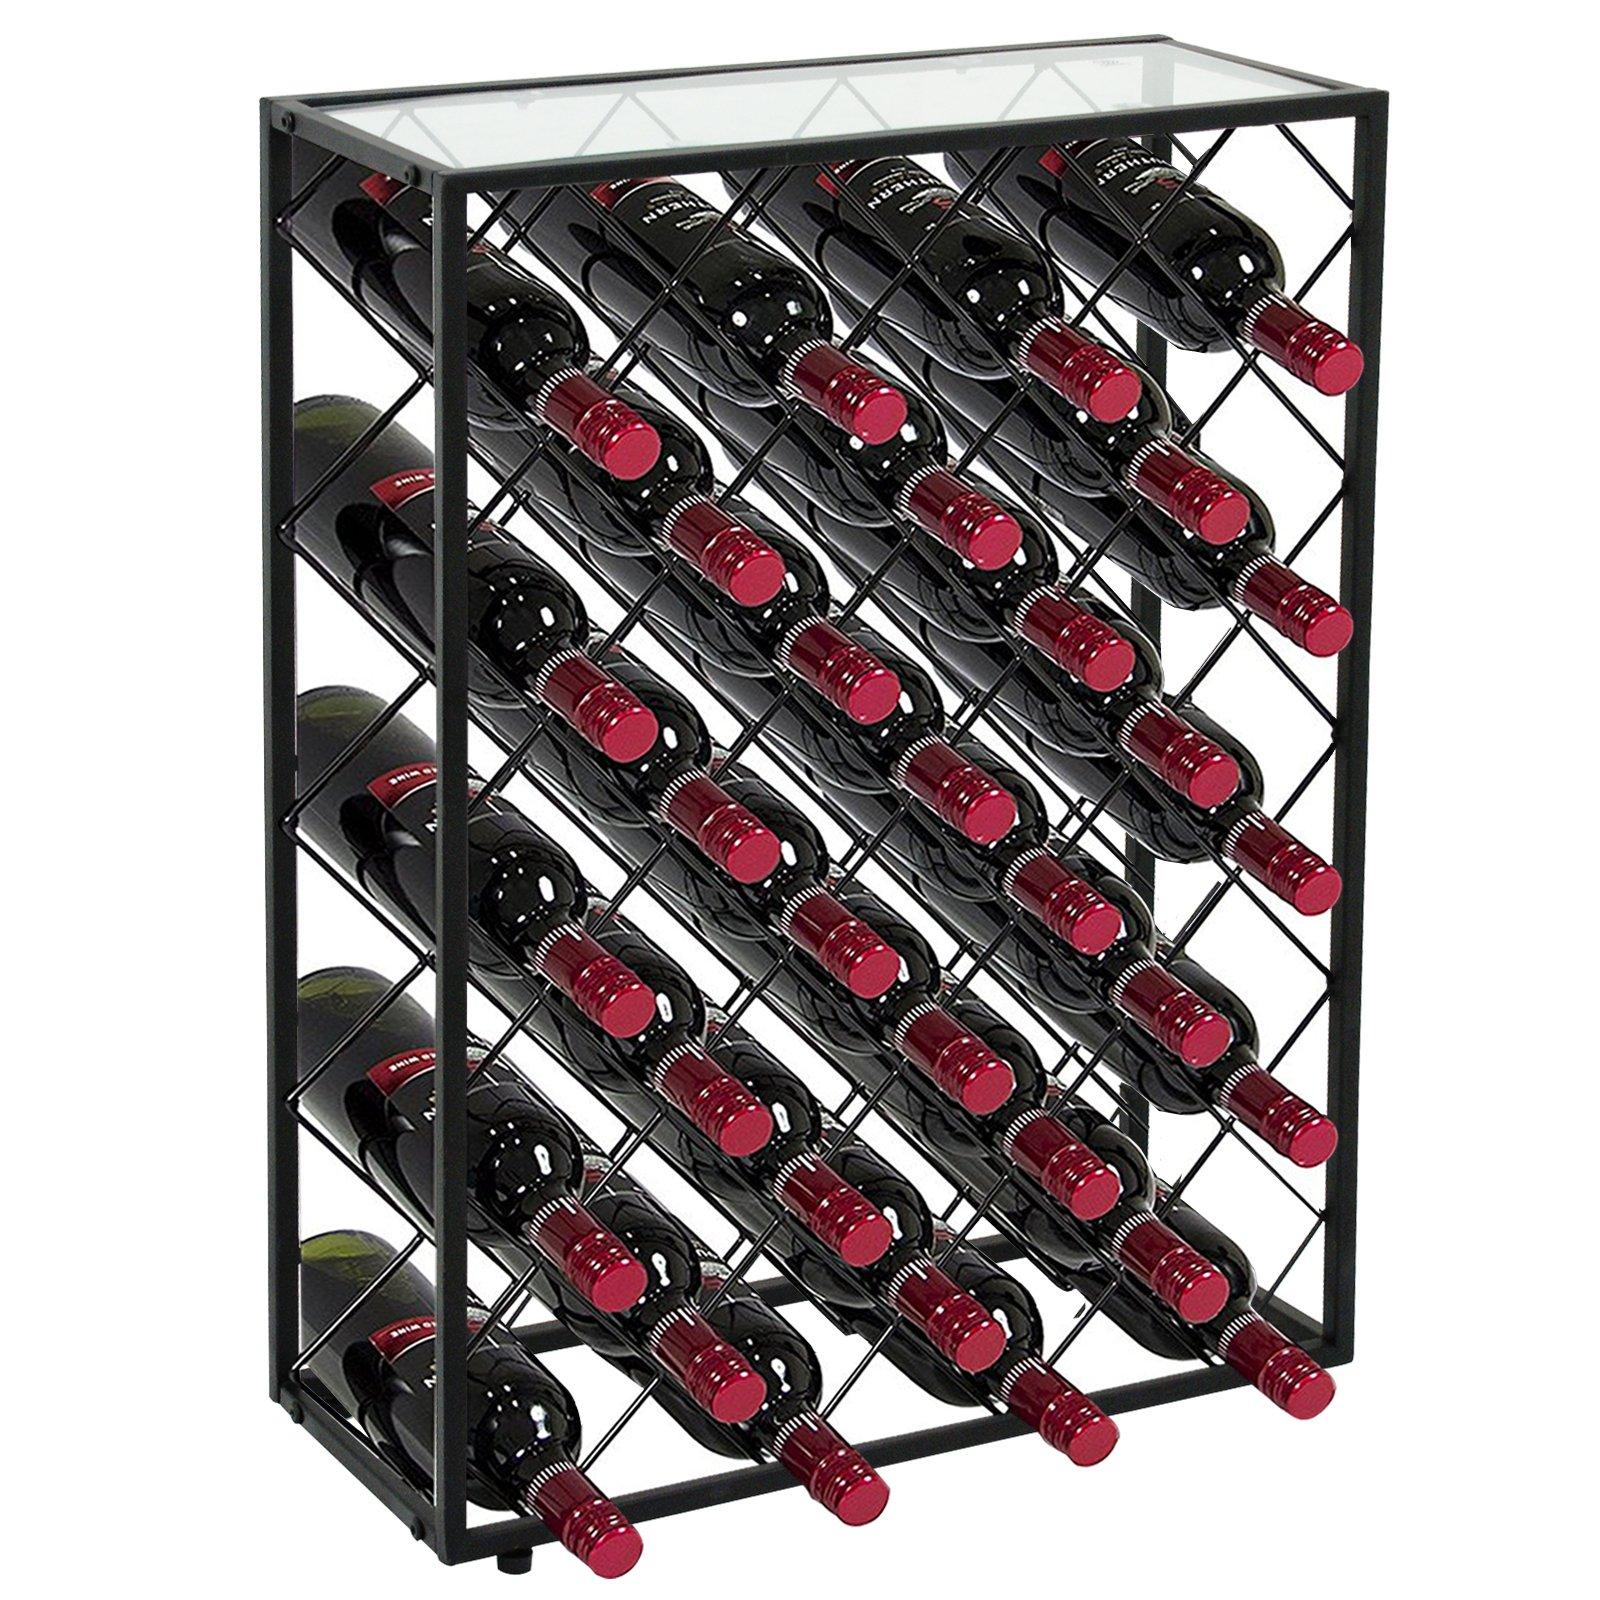 LEMY 32 Bottle Wine Rack Holders Stands Liquor Storage Corner Wine Cabinet with Glassy Table Top, Metal Construction, Black